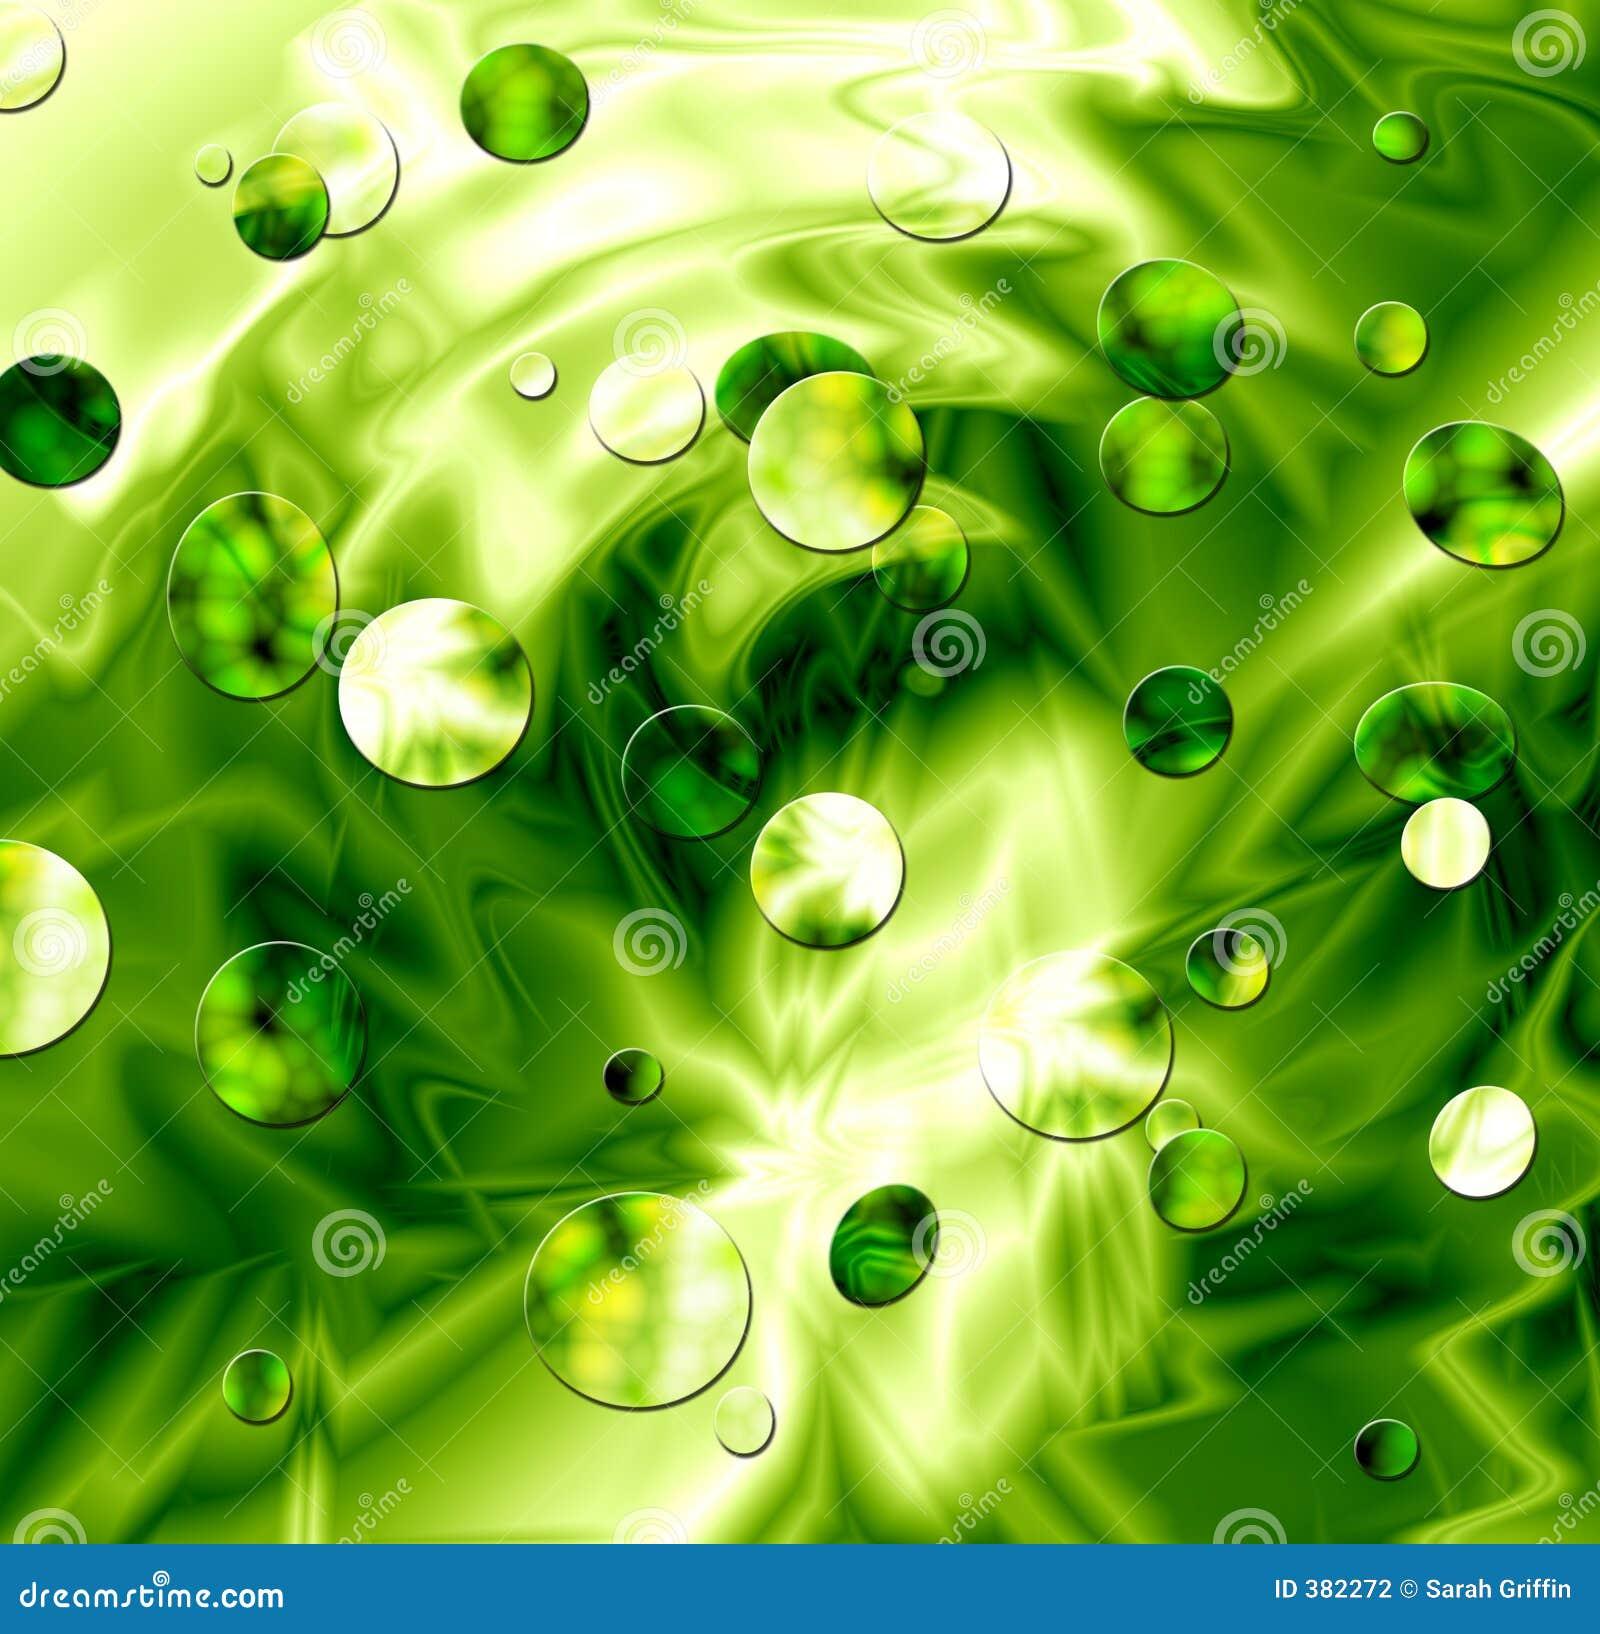 Green Slime Circles Texture Background Illustration. Tuxedo Shirt